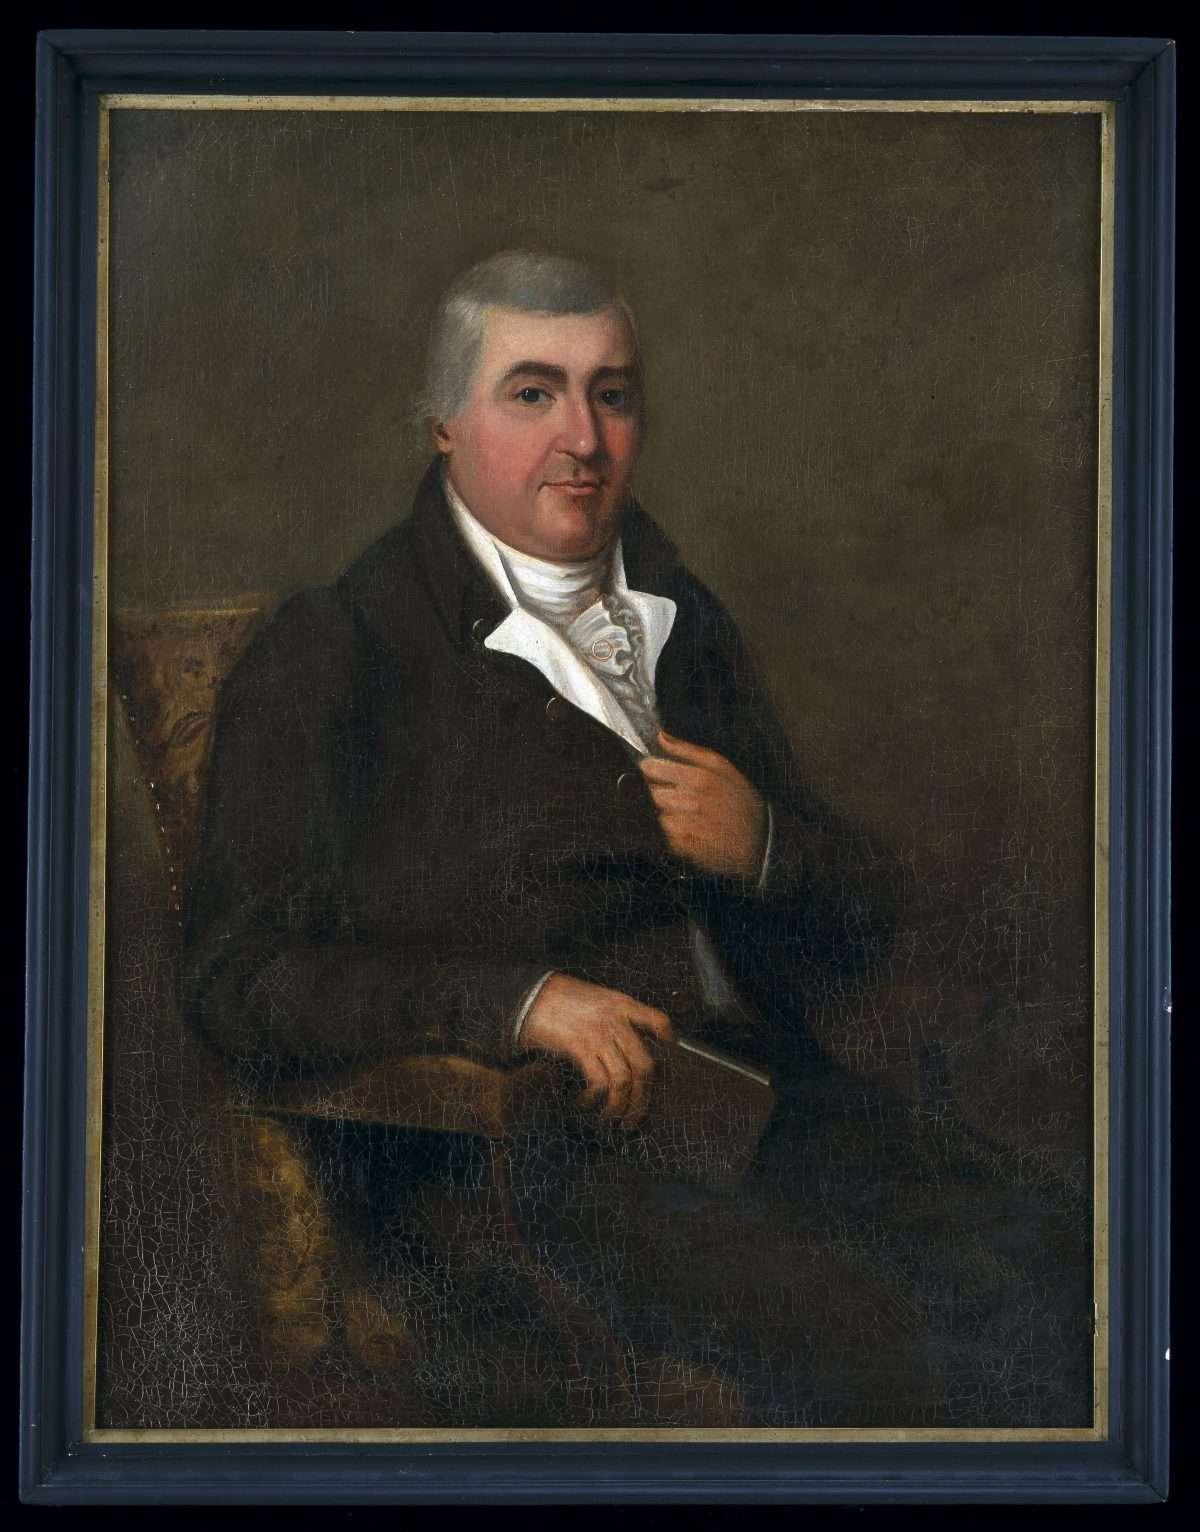 Nathaniel Burwell (1750—1814)